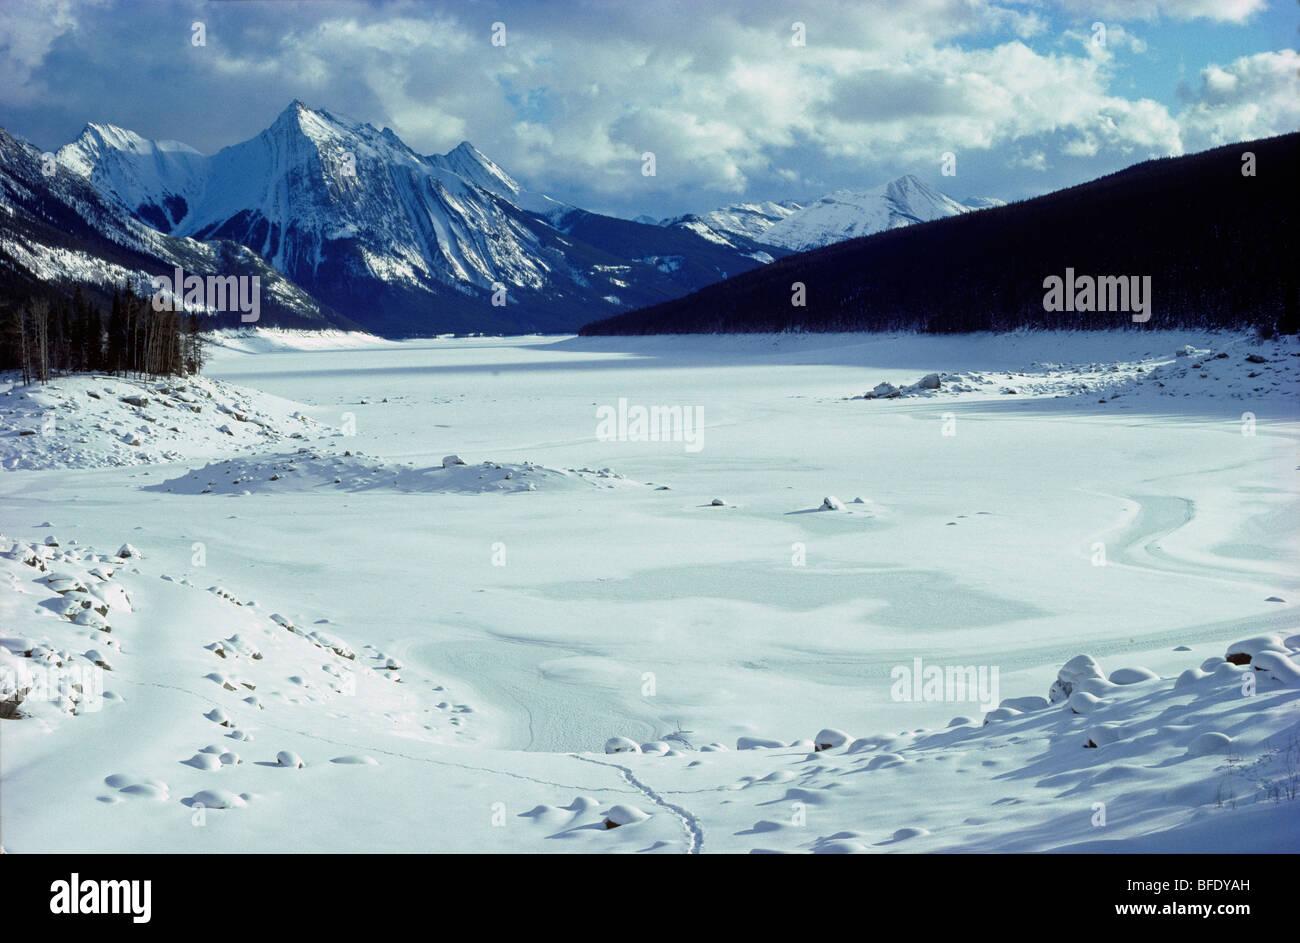 Medicine Lake in winter, view southeast toward the Queen Elizabeth Range, Jasper National Park, Alberta, Canada - Stock Image